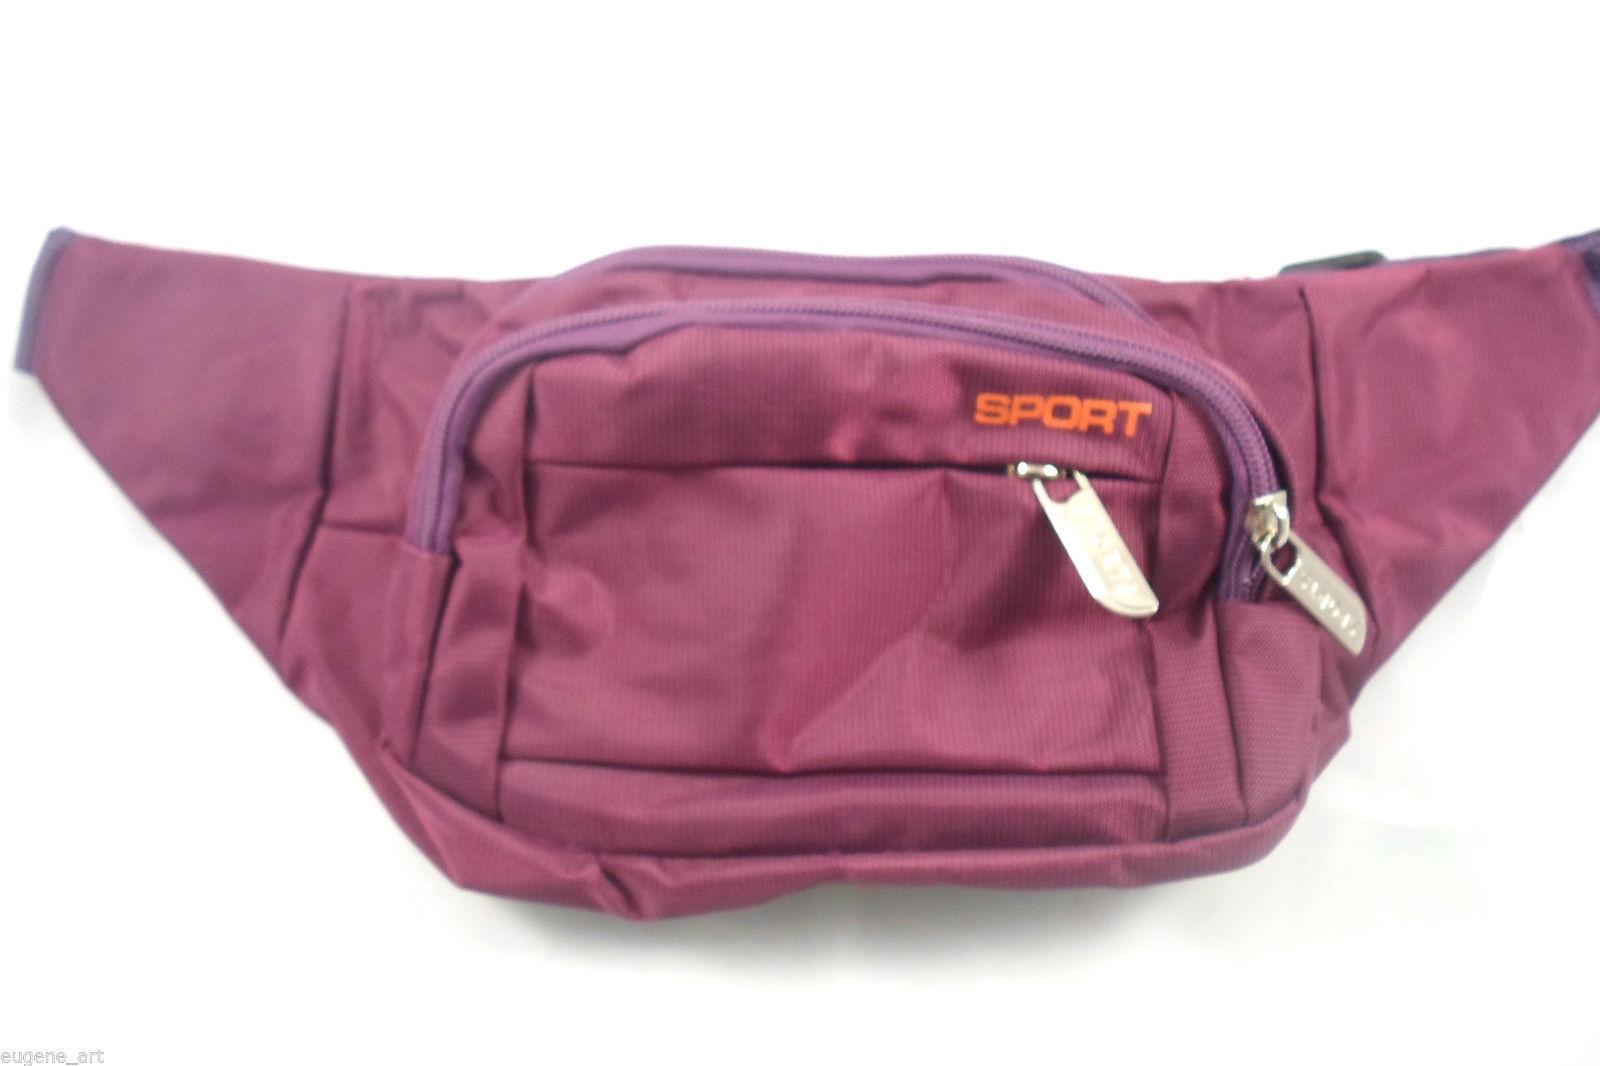 9.87$  Watch now - http://vierv.justgood.pw/vig/item.php?t=pl9df4s8307 - Waist Medium Round Spacious Expandable Fanny Bag Purple Comfy Unisex Canvas 9.87$